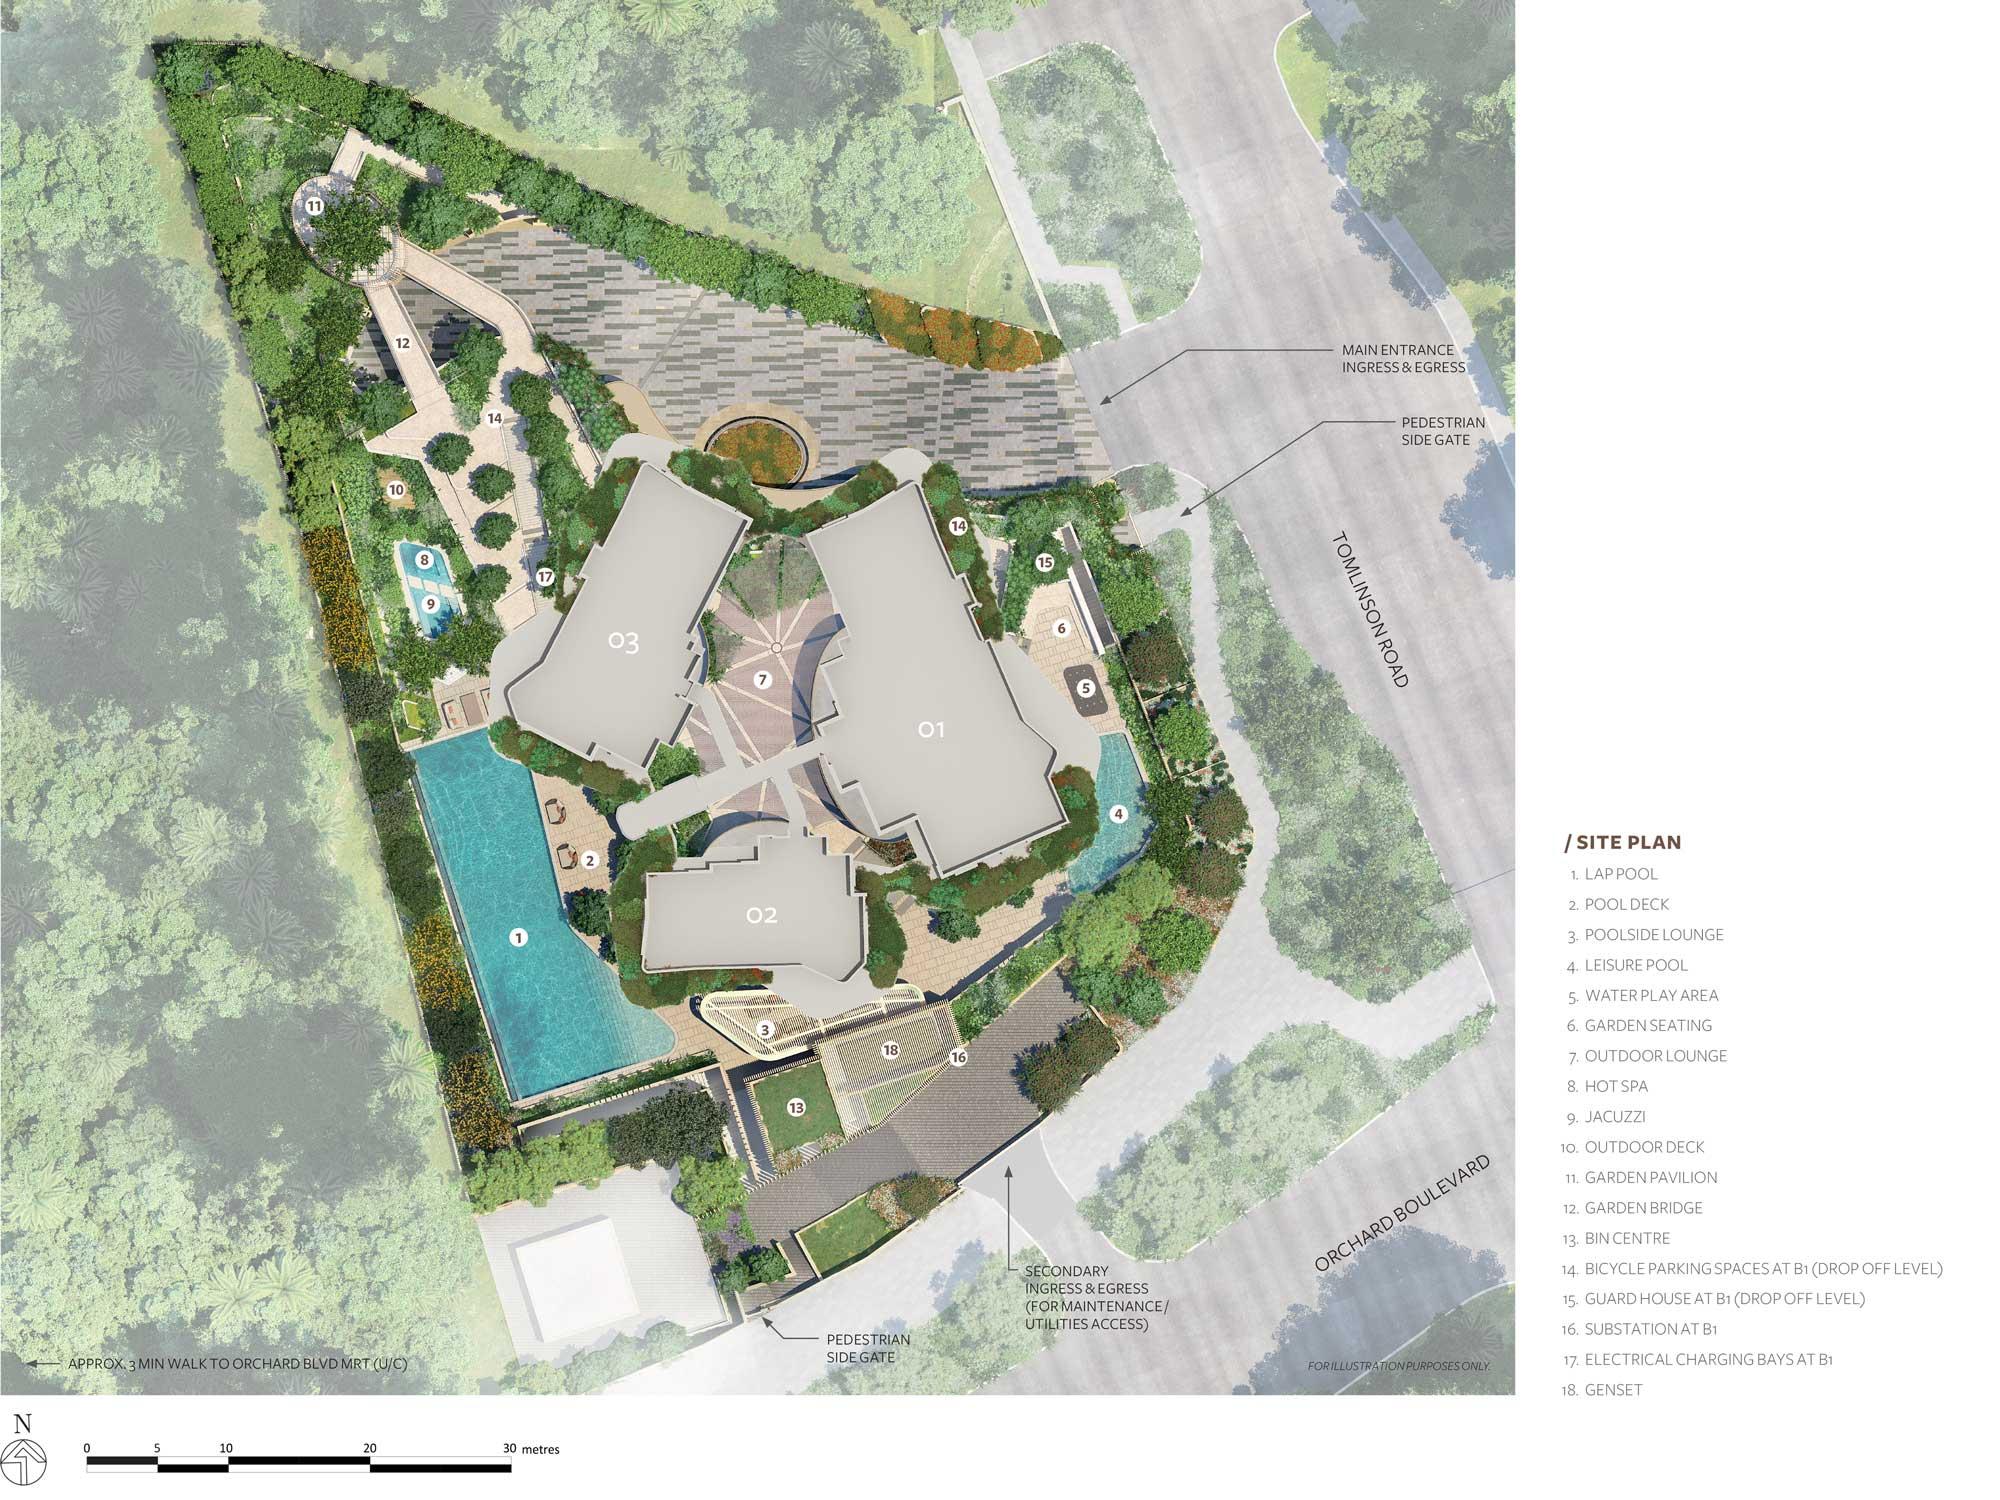 15 Holland Hill Site Plan